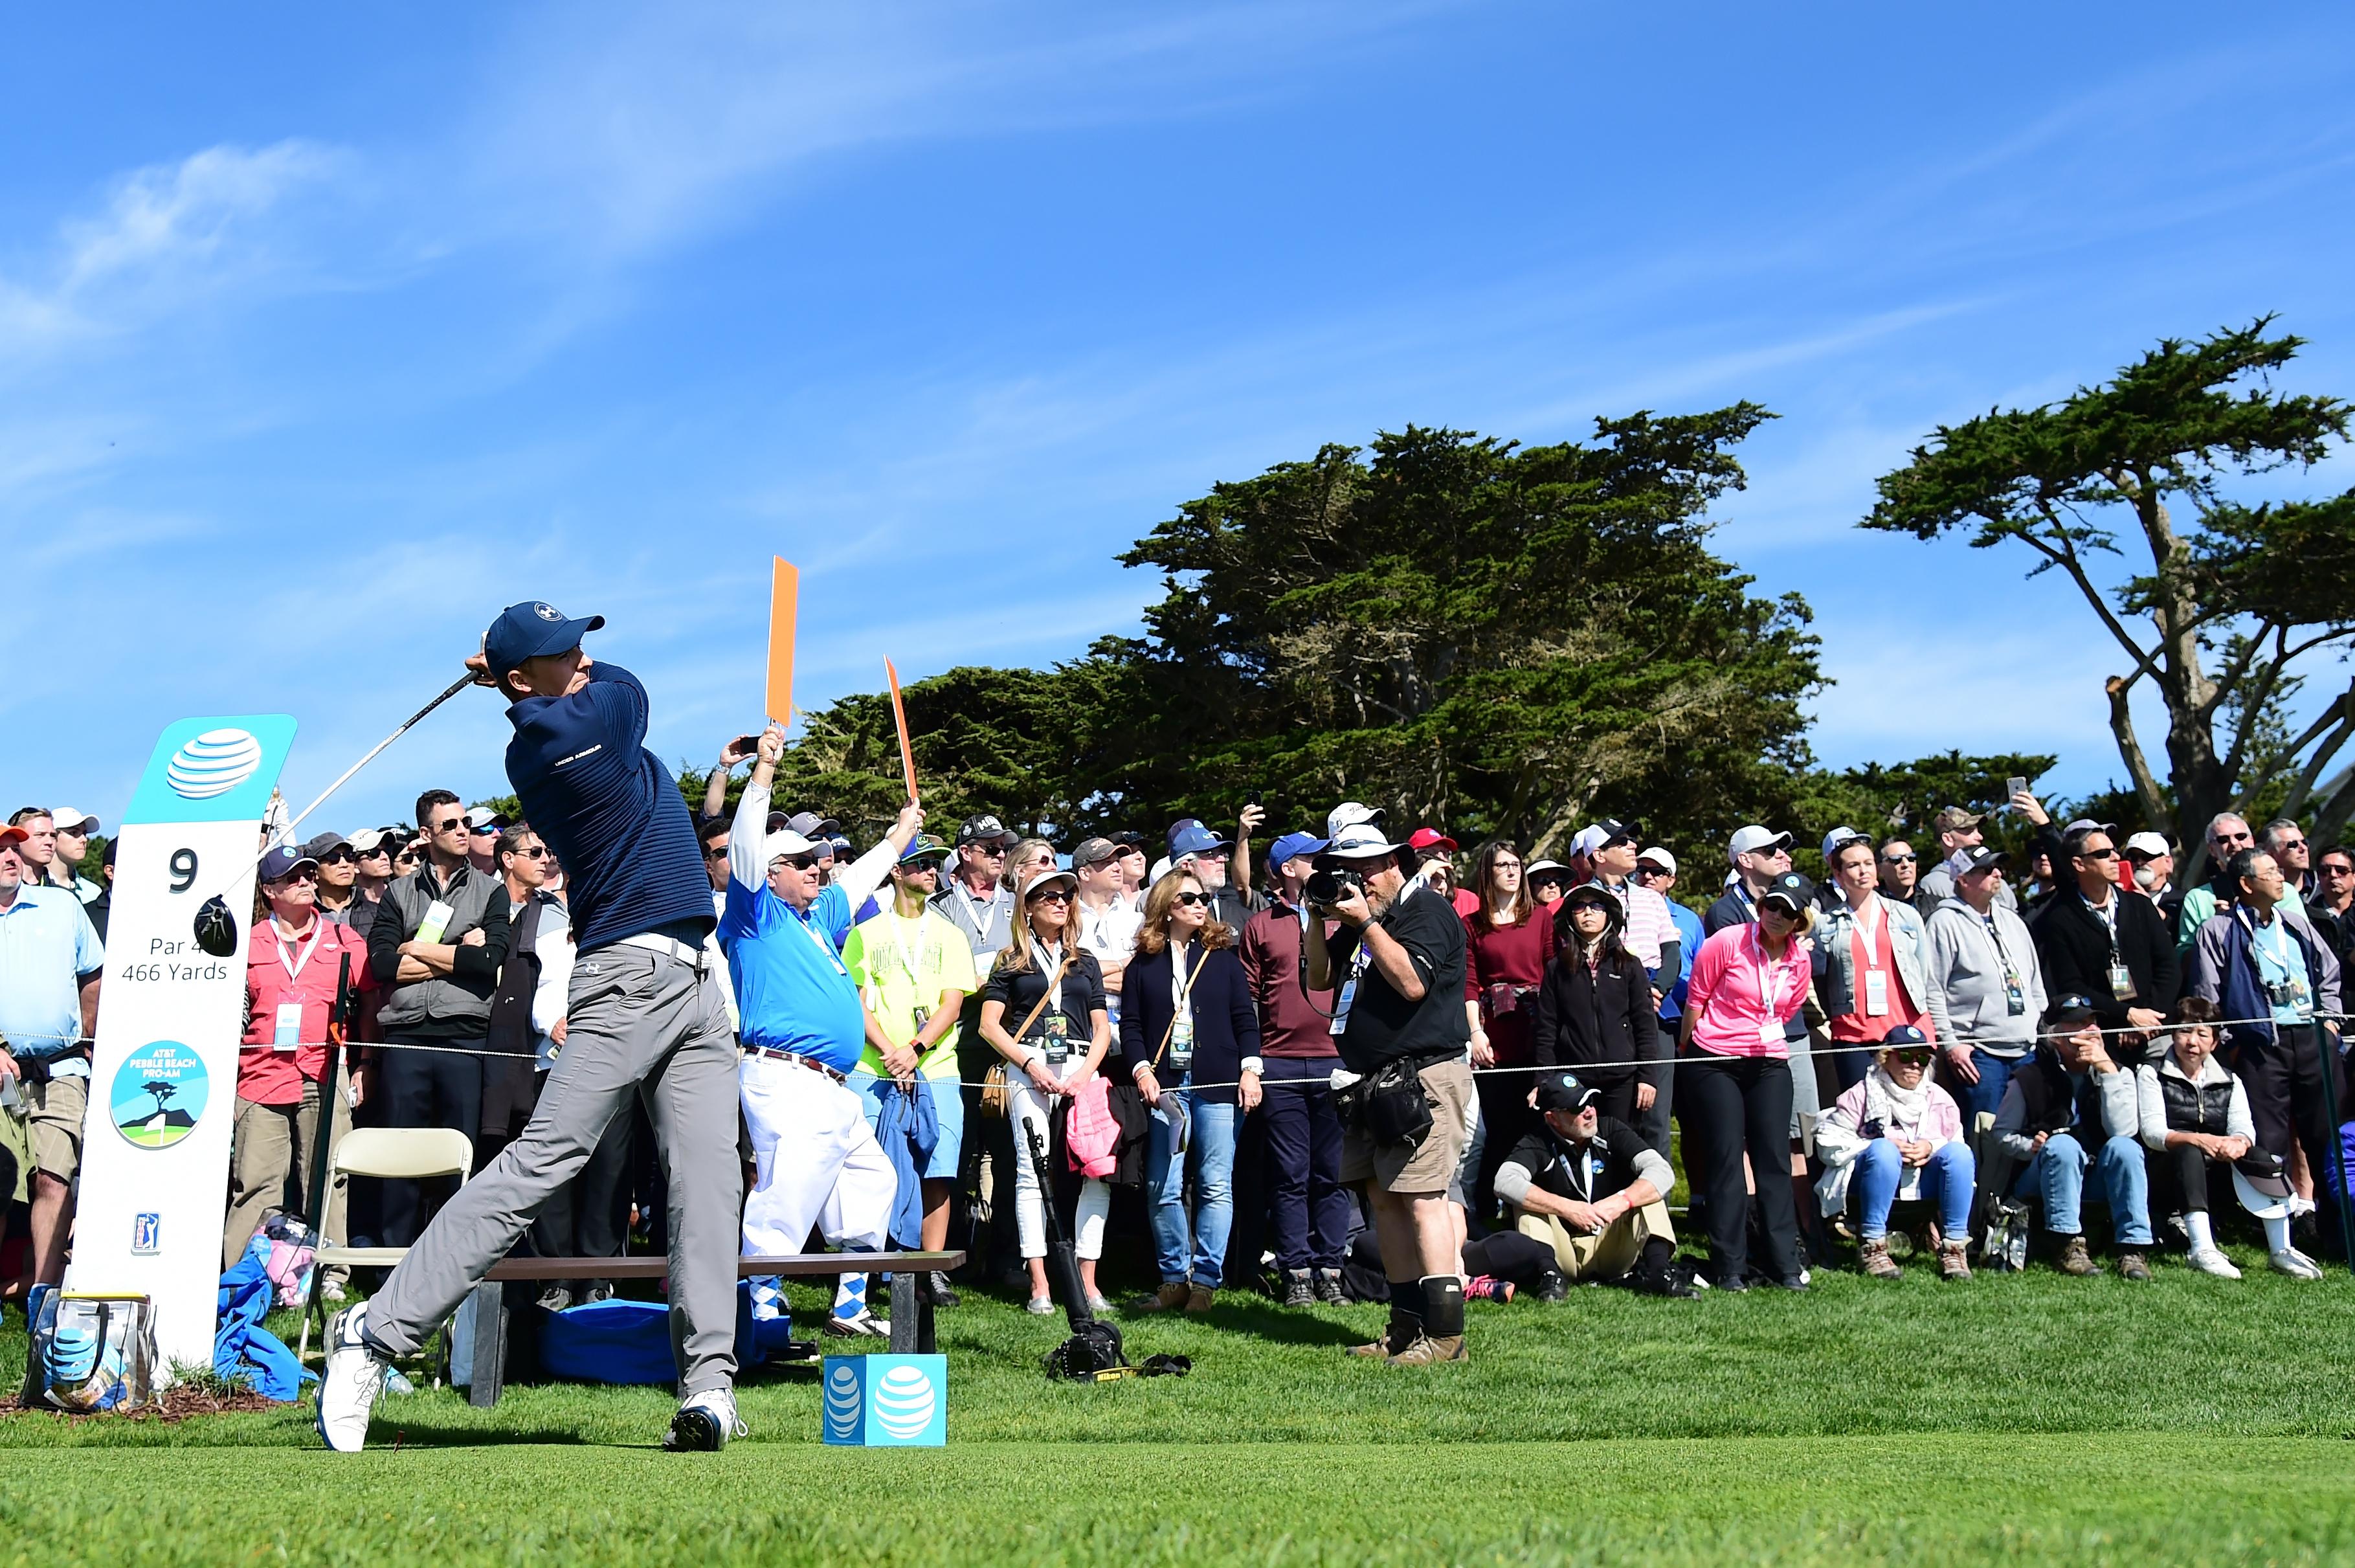 Jordan Spieth picked up PGA Tour victory No. 9 on Sunday at Pebble Beach Golf Links.